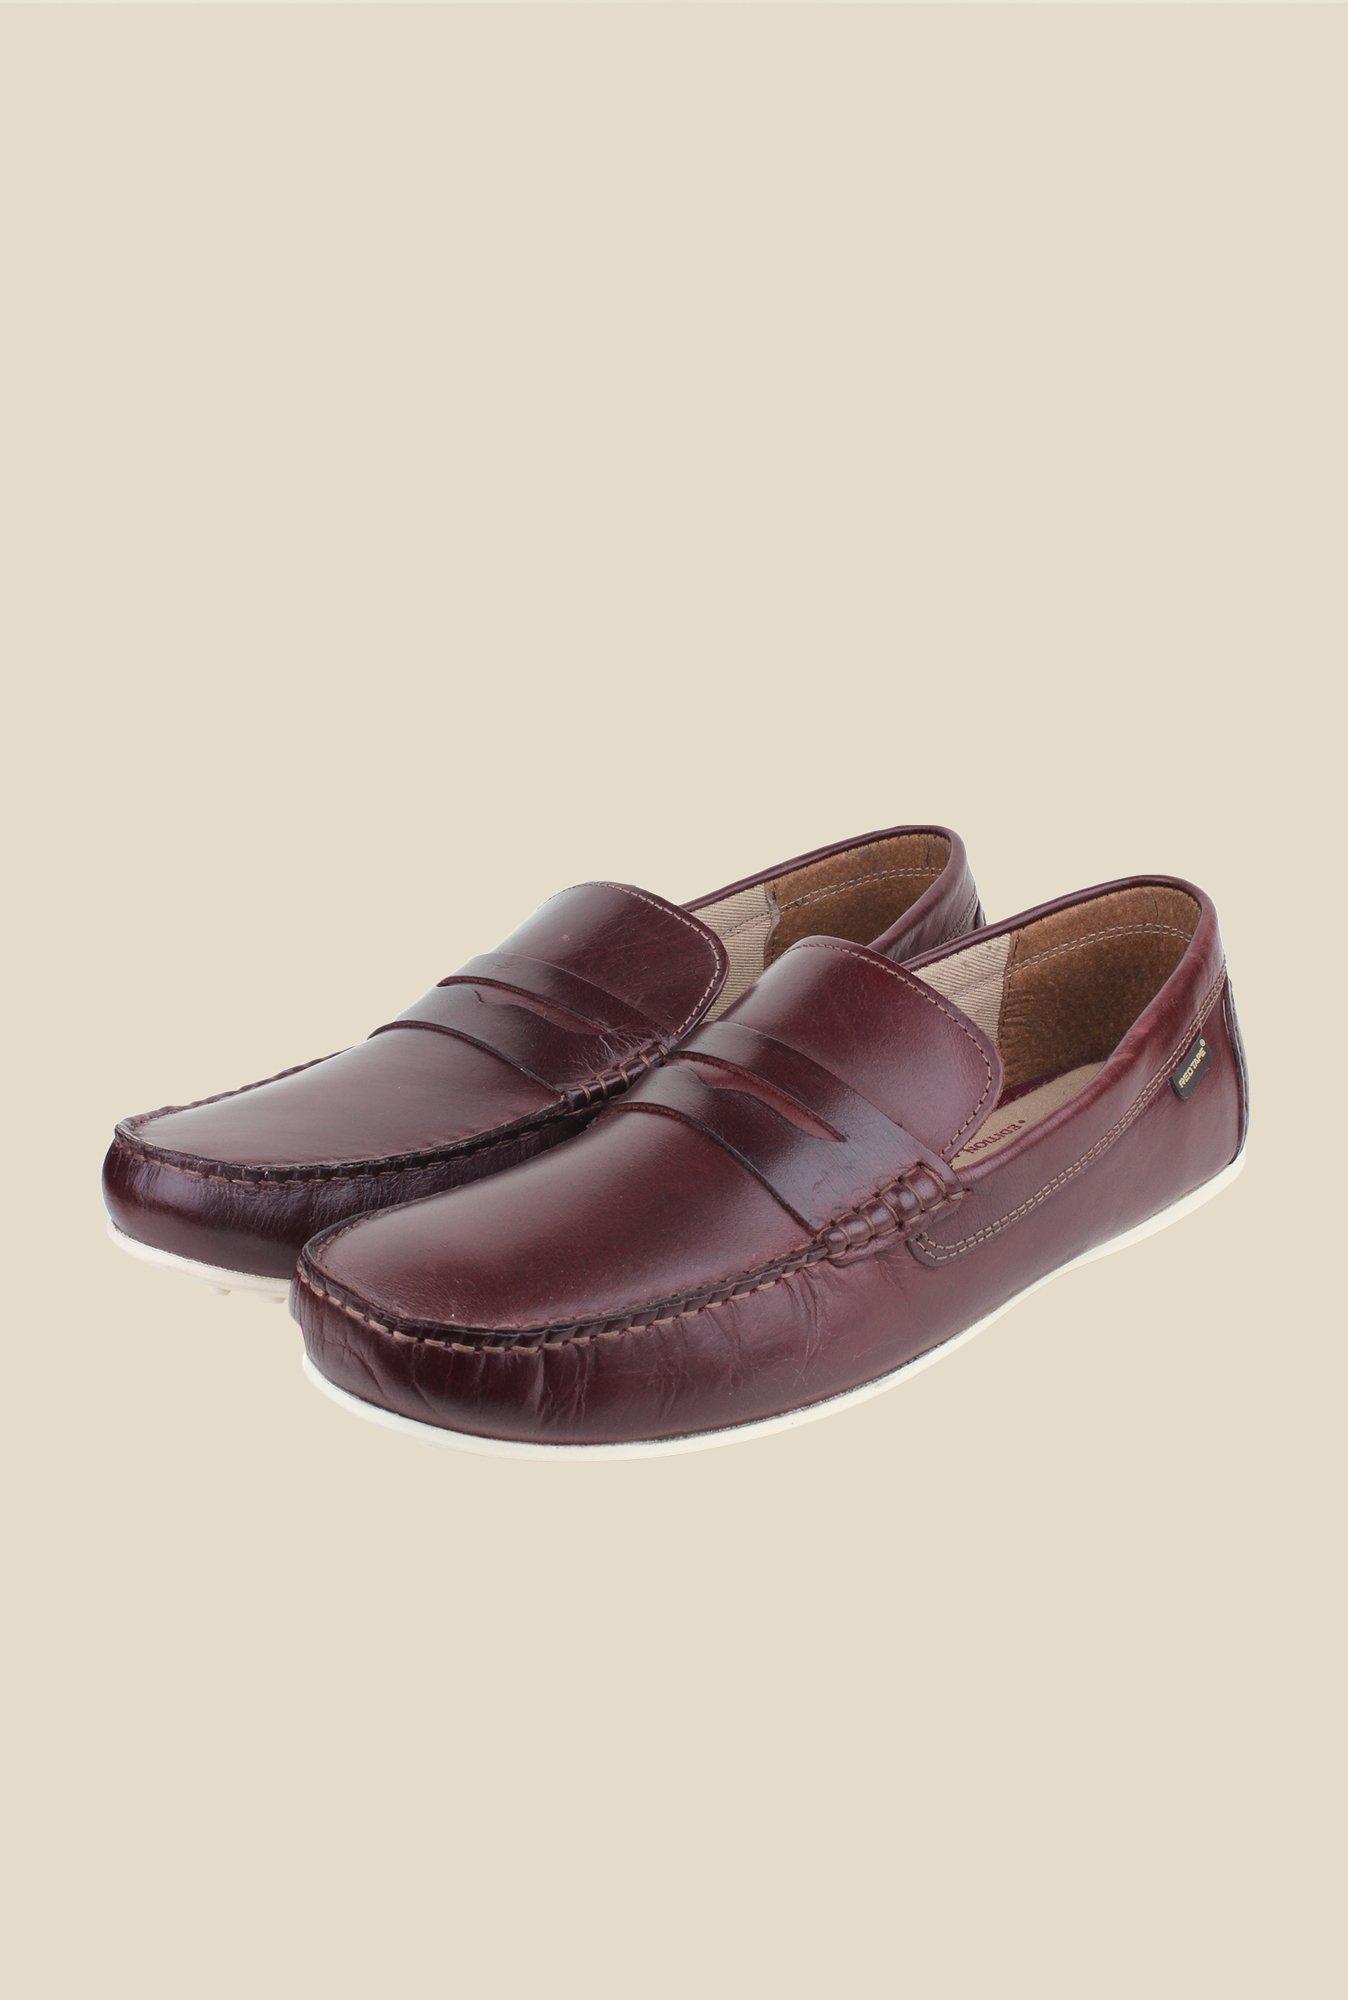 15d982221 Beonza Premium Denim Loafers-Rs.699 Flipkart